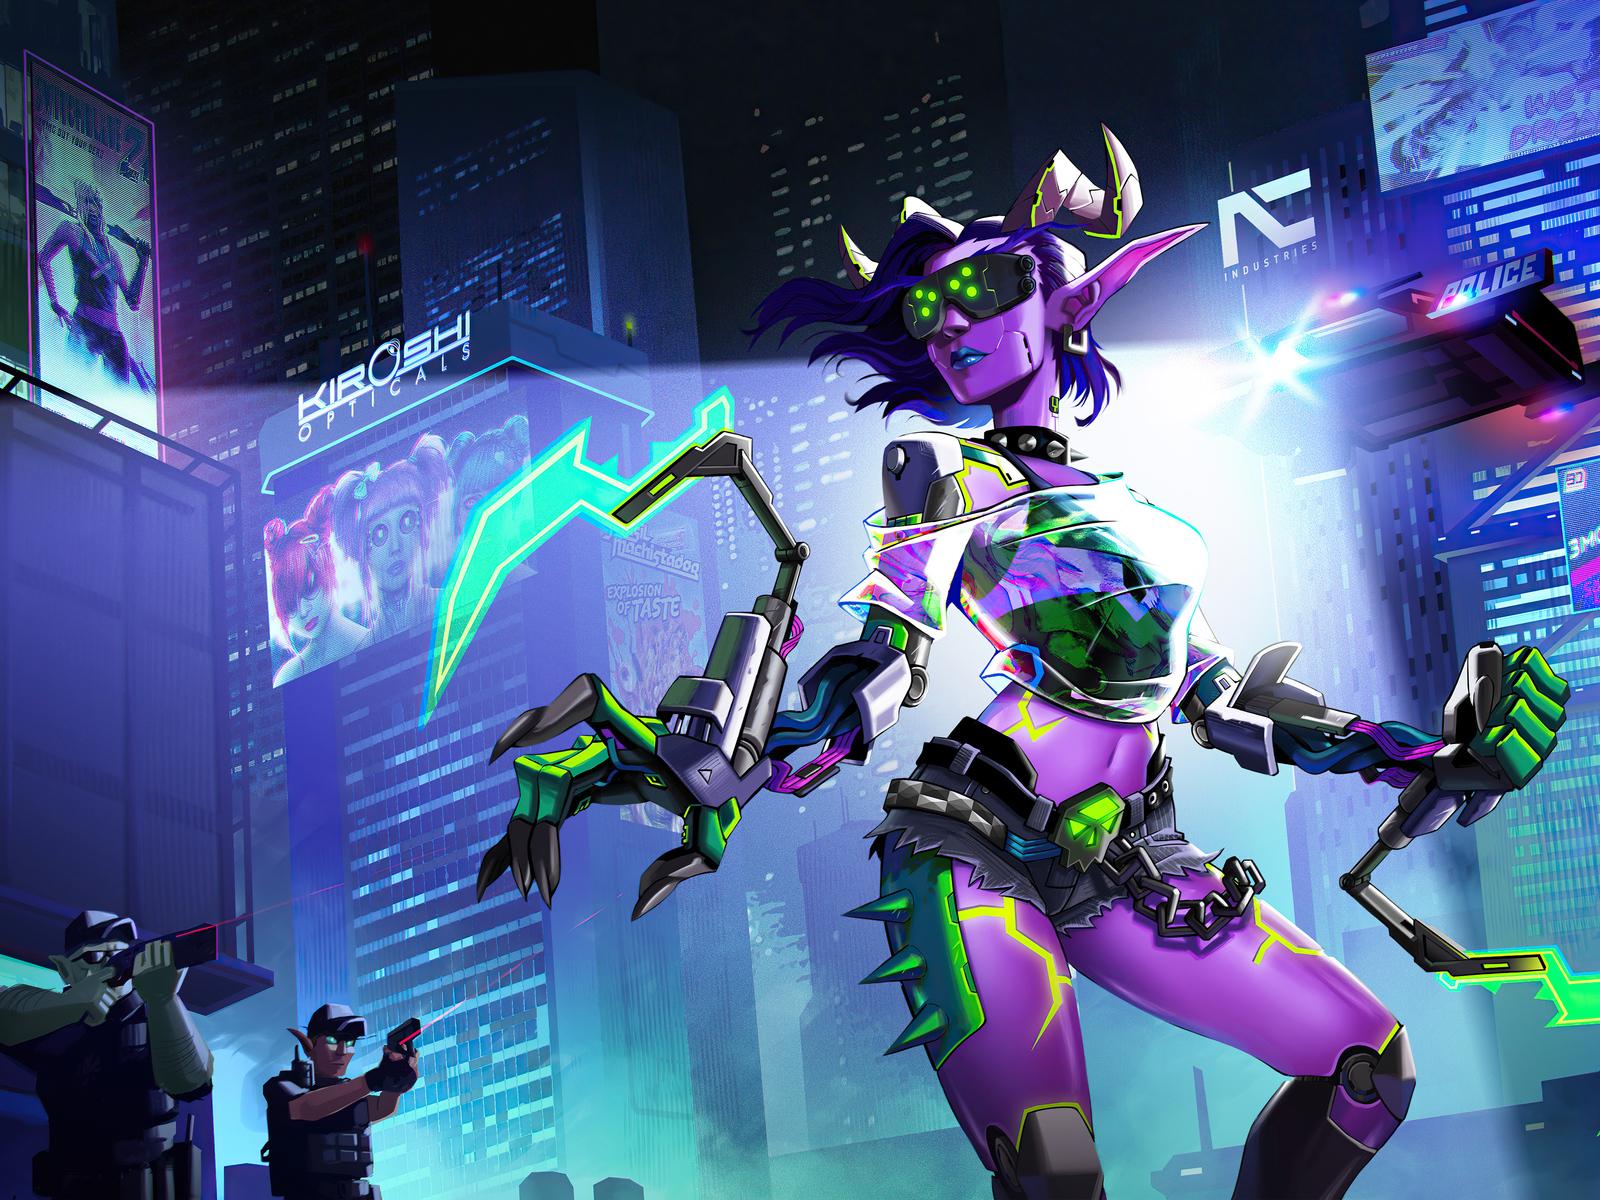 world-of-warcraft-x-cyberpunk-2077-za.jpg